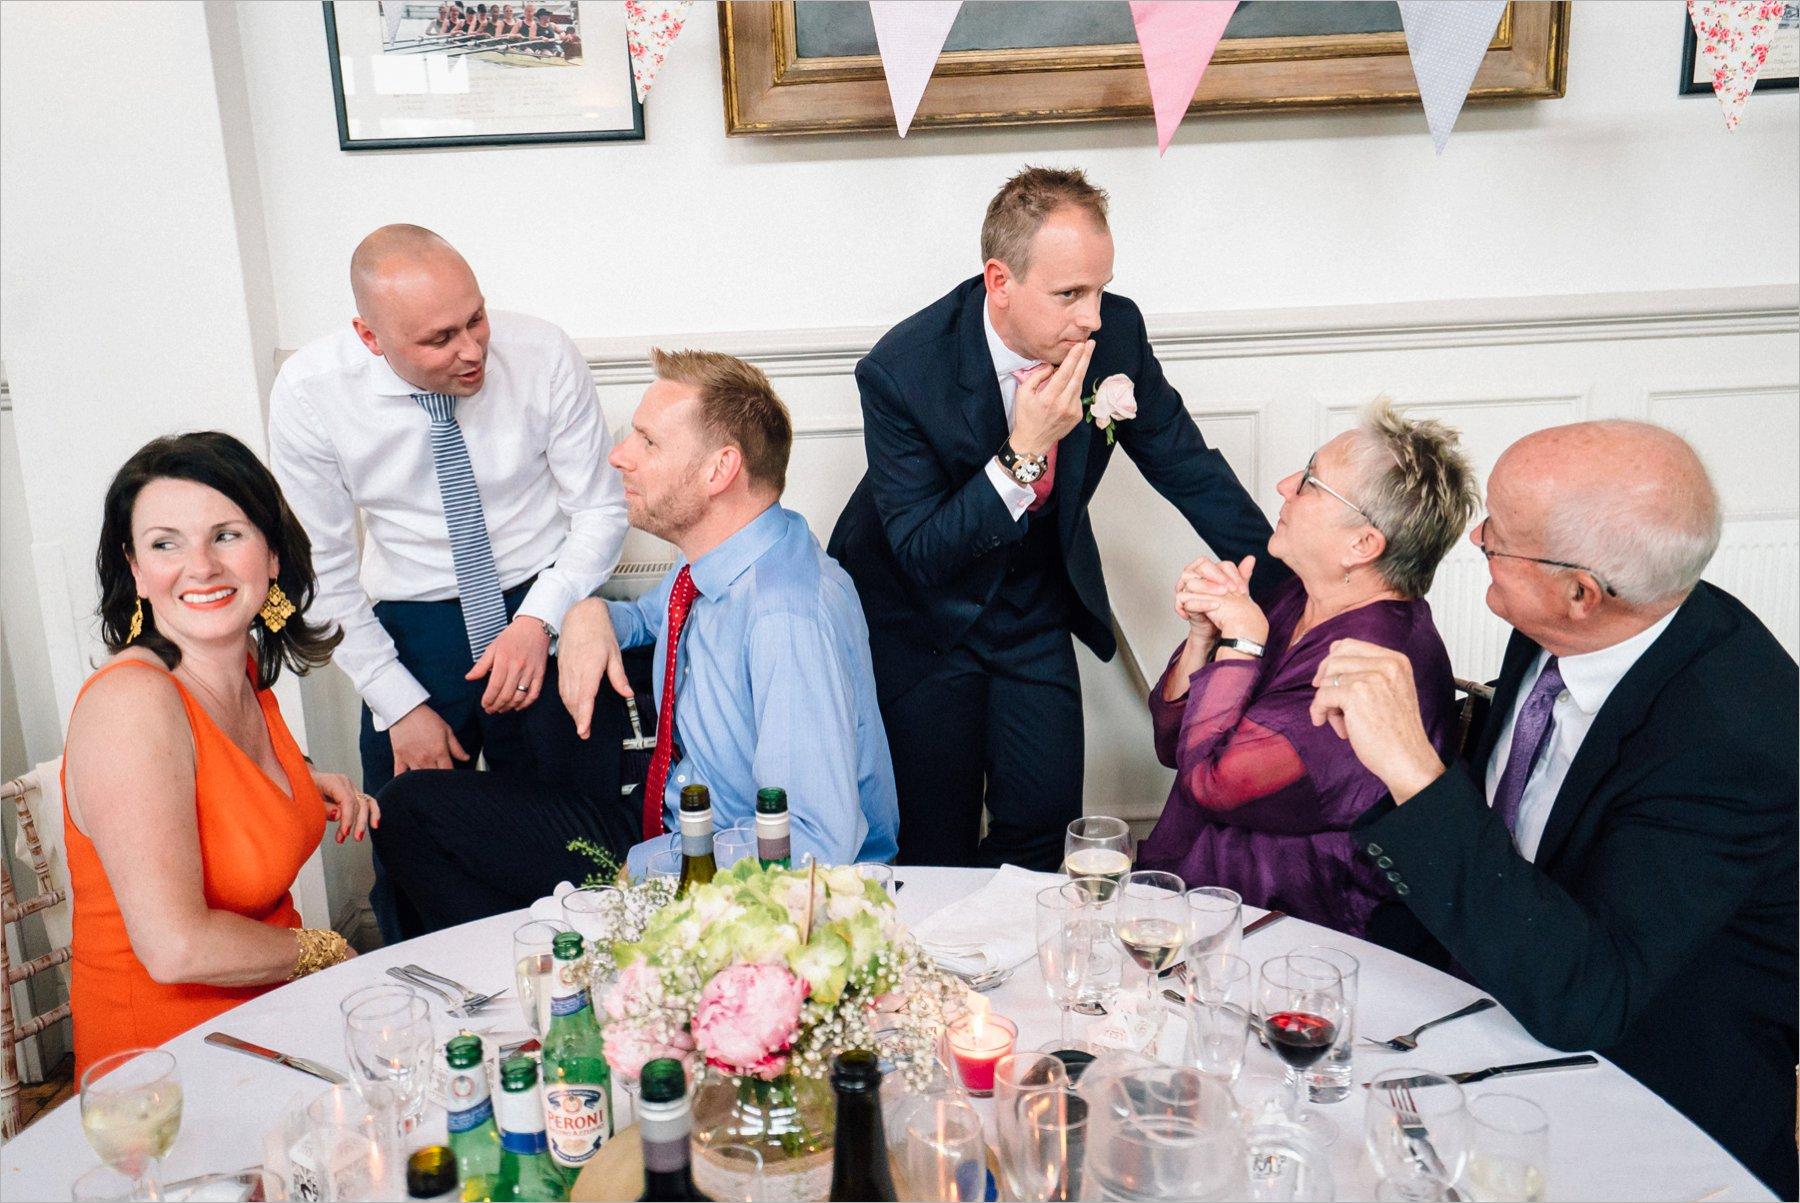 gossiping wedding guests